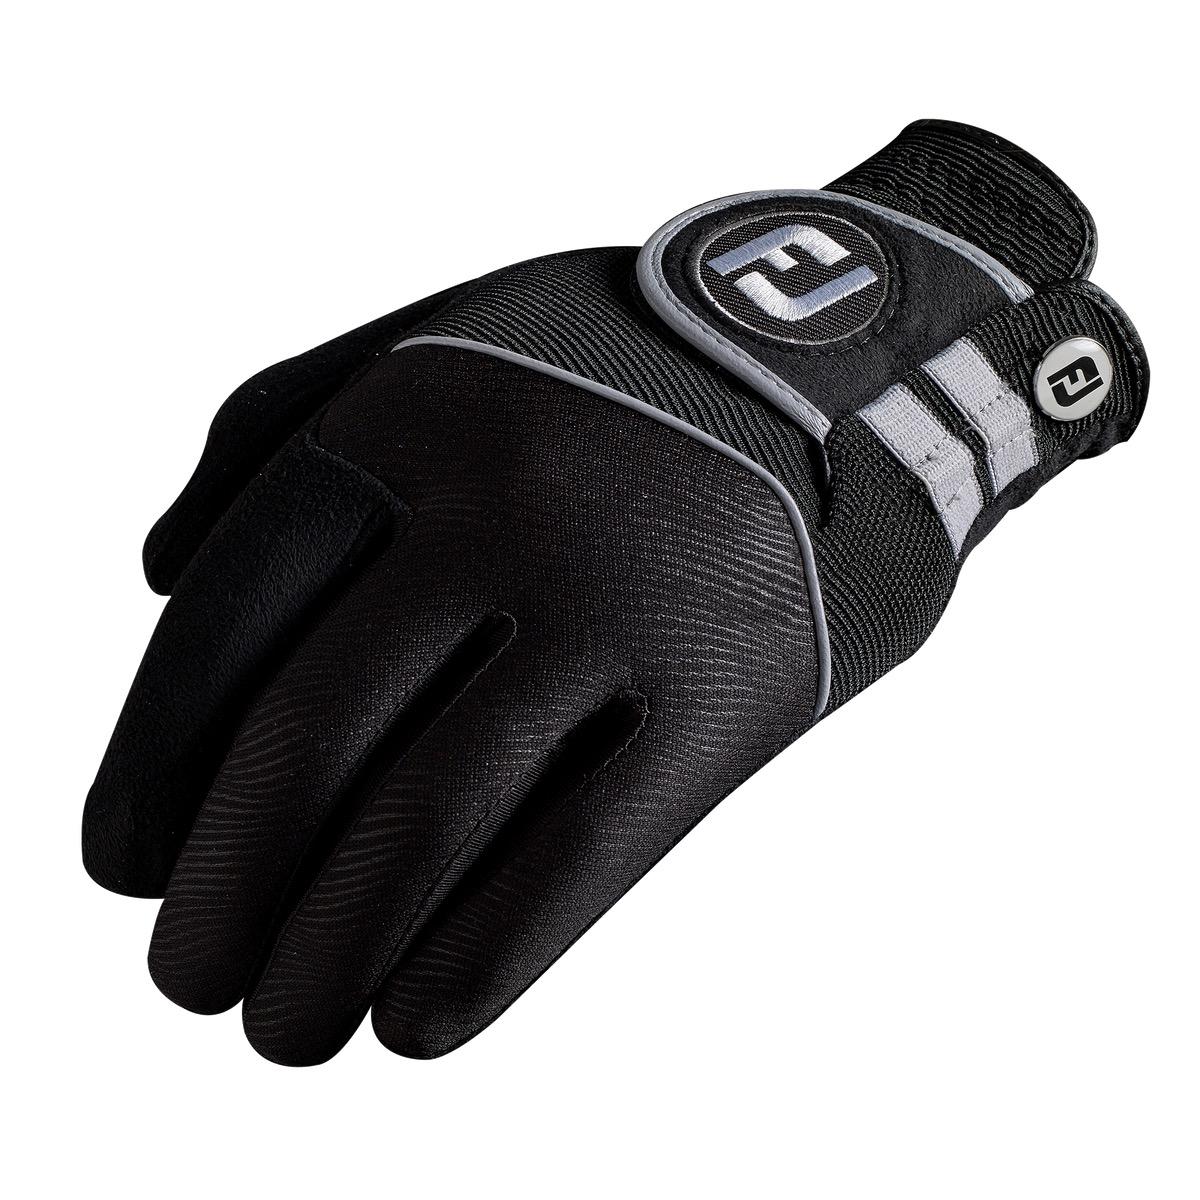 RainGrip Handschuhe, schwarz